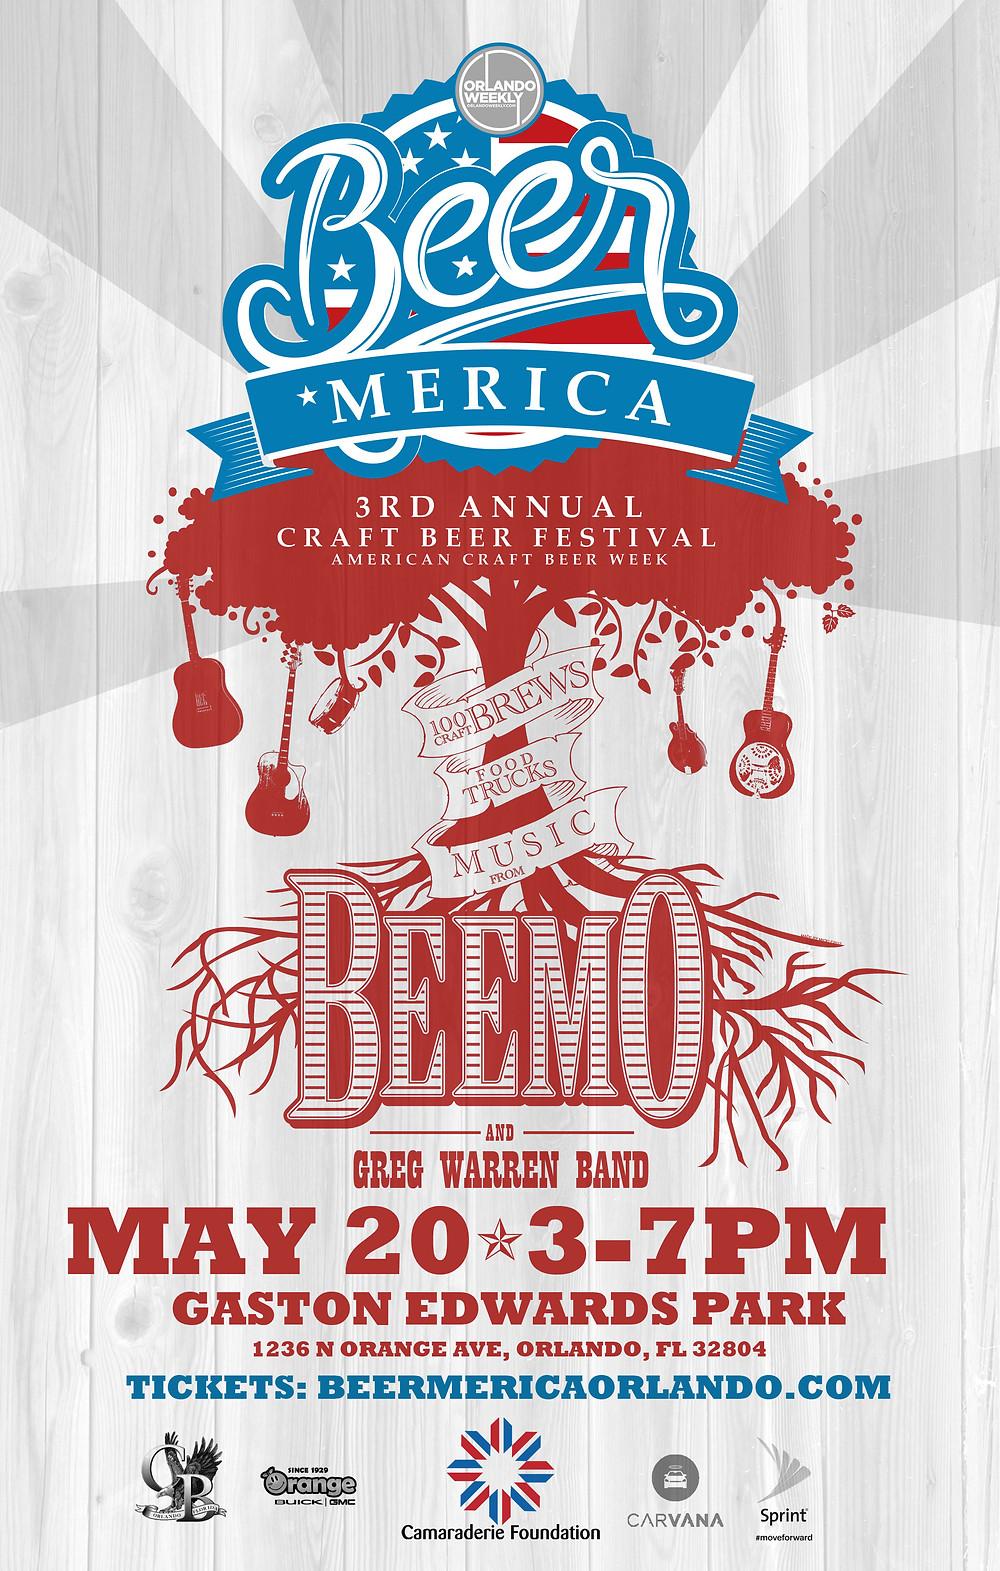 Beer 'Merica Wakeboard and Wakesurf Demo with Wakesurf Orlando